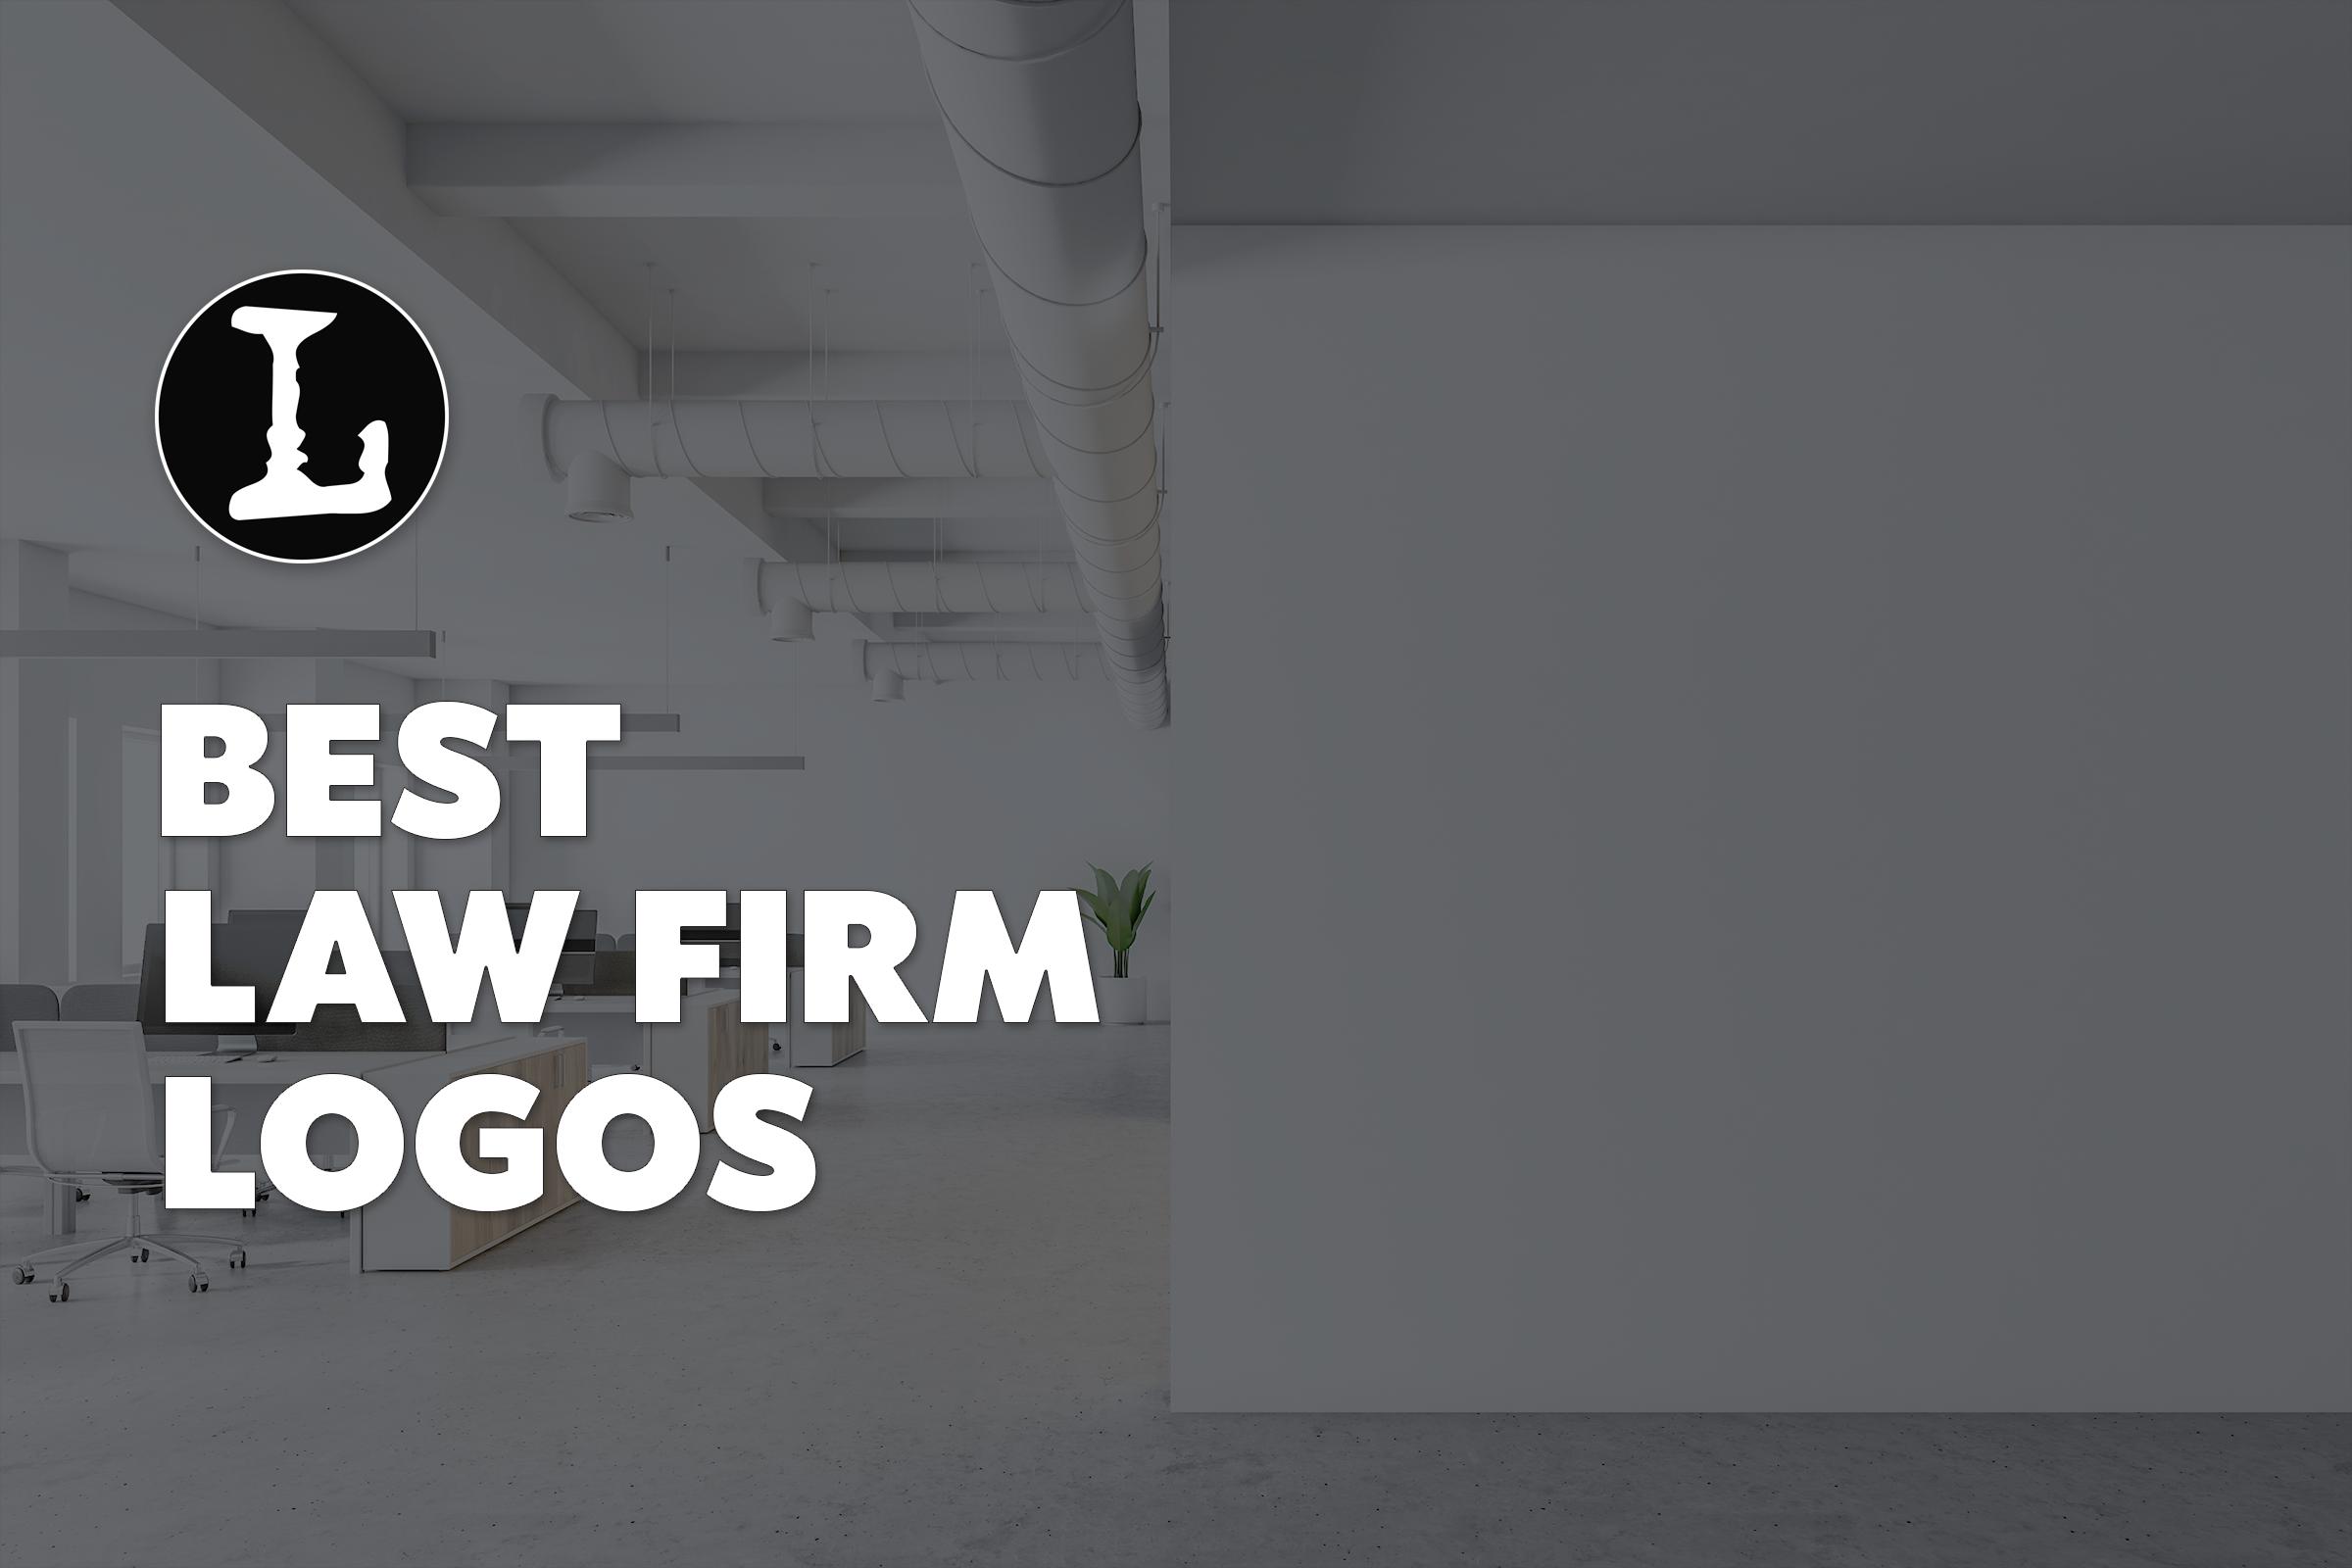 Best Law Firm Logos